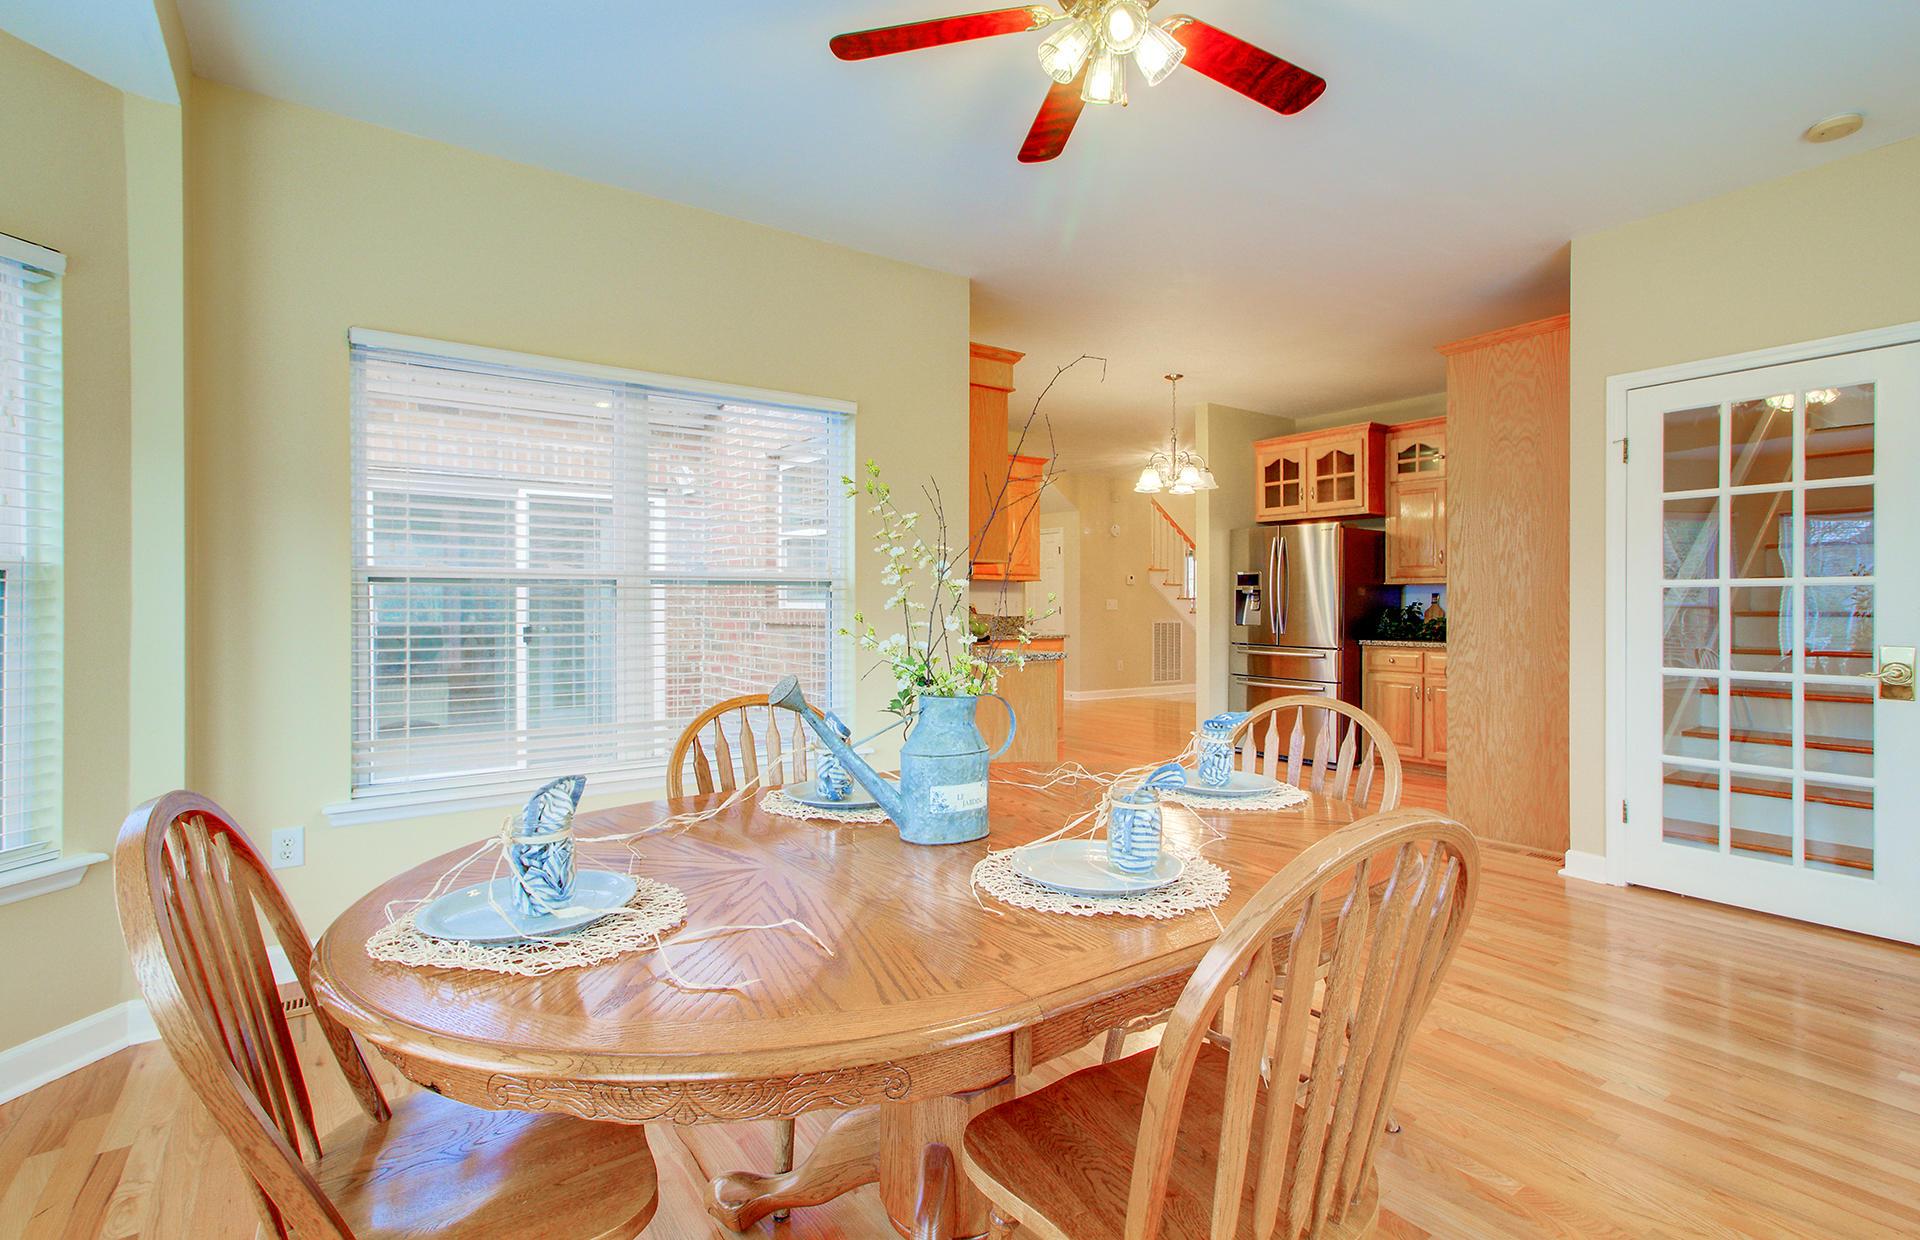 Bakers Landing Homes For Sale - 105 River Oak, North Charleston, SC - 19